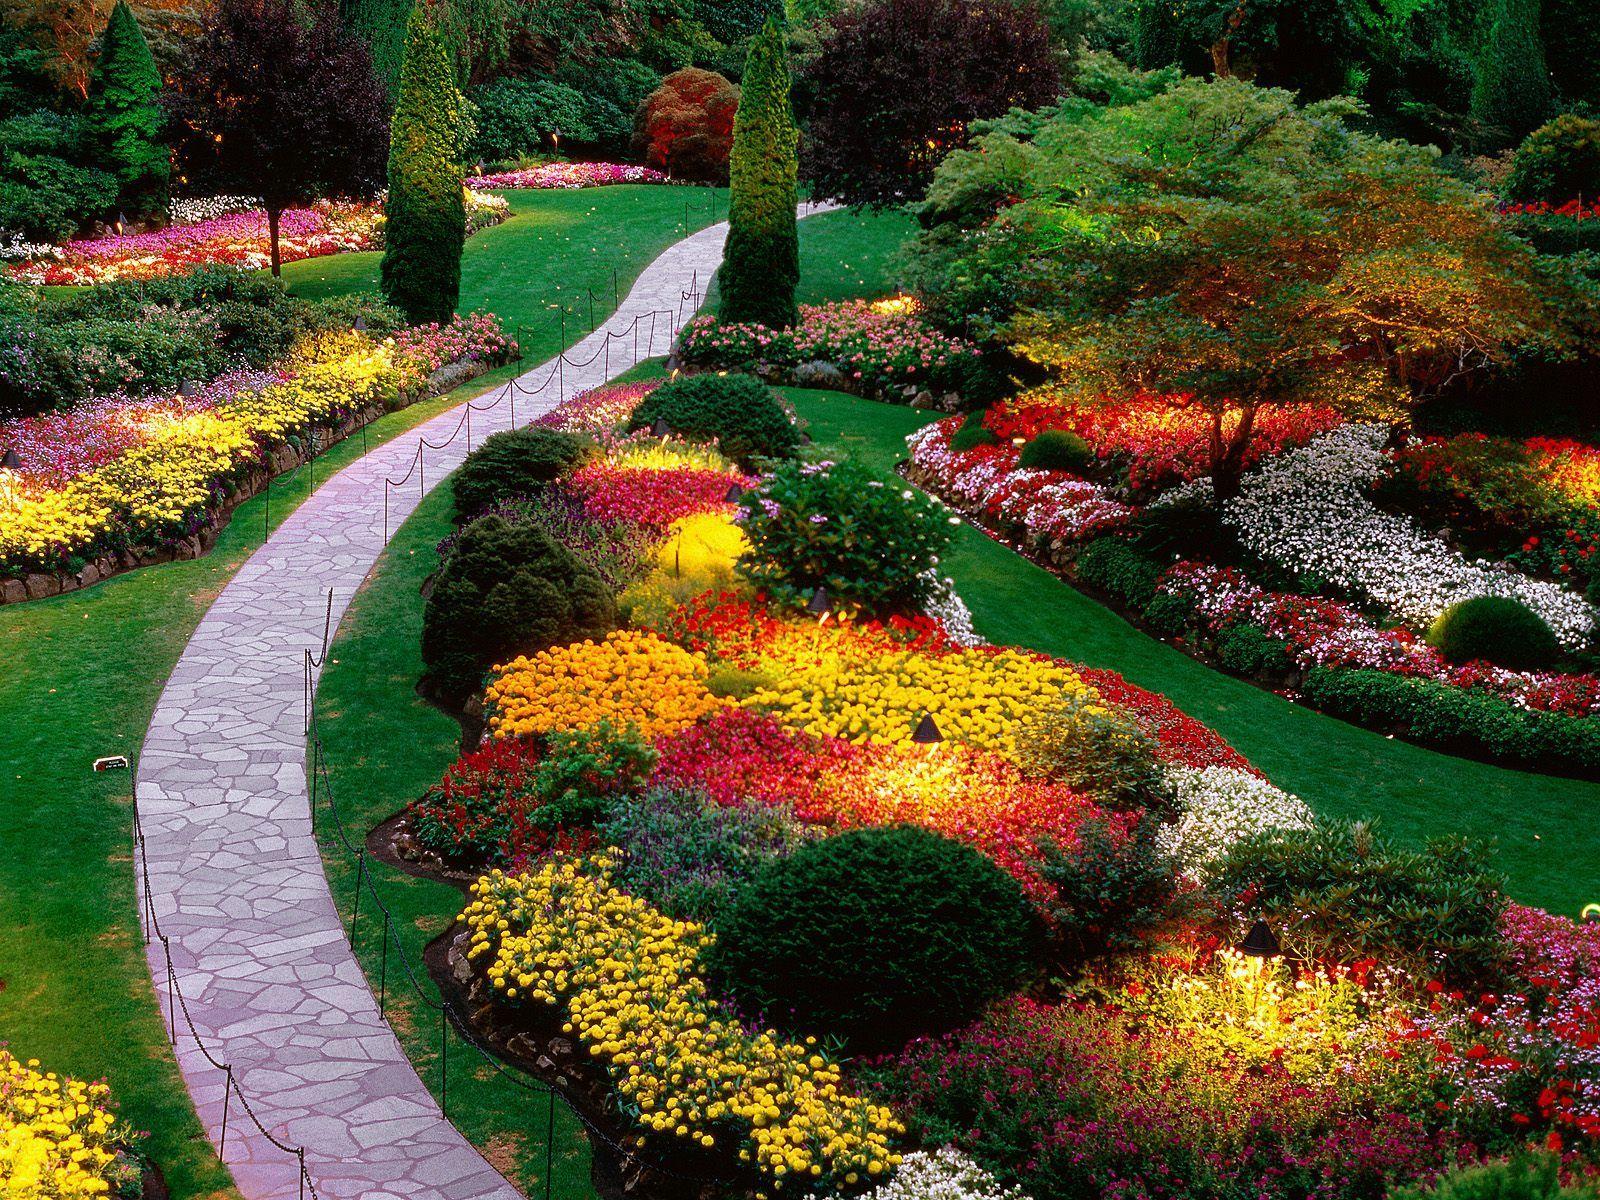 jardineras - Jardineria Y Paisajismo